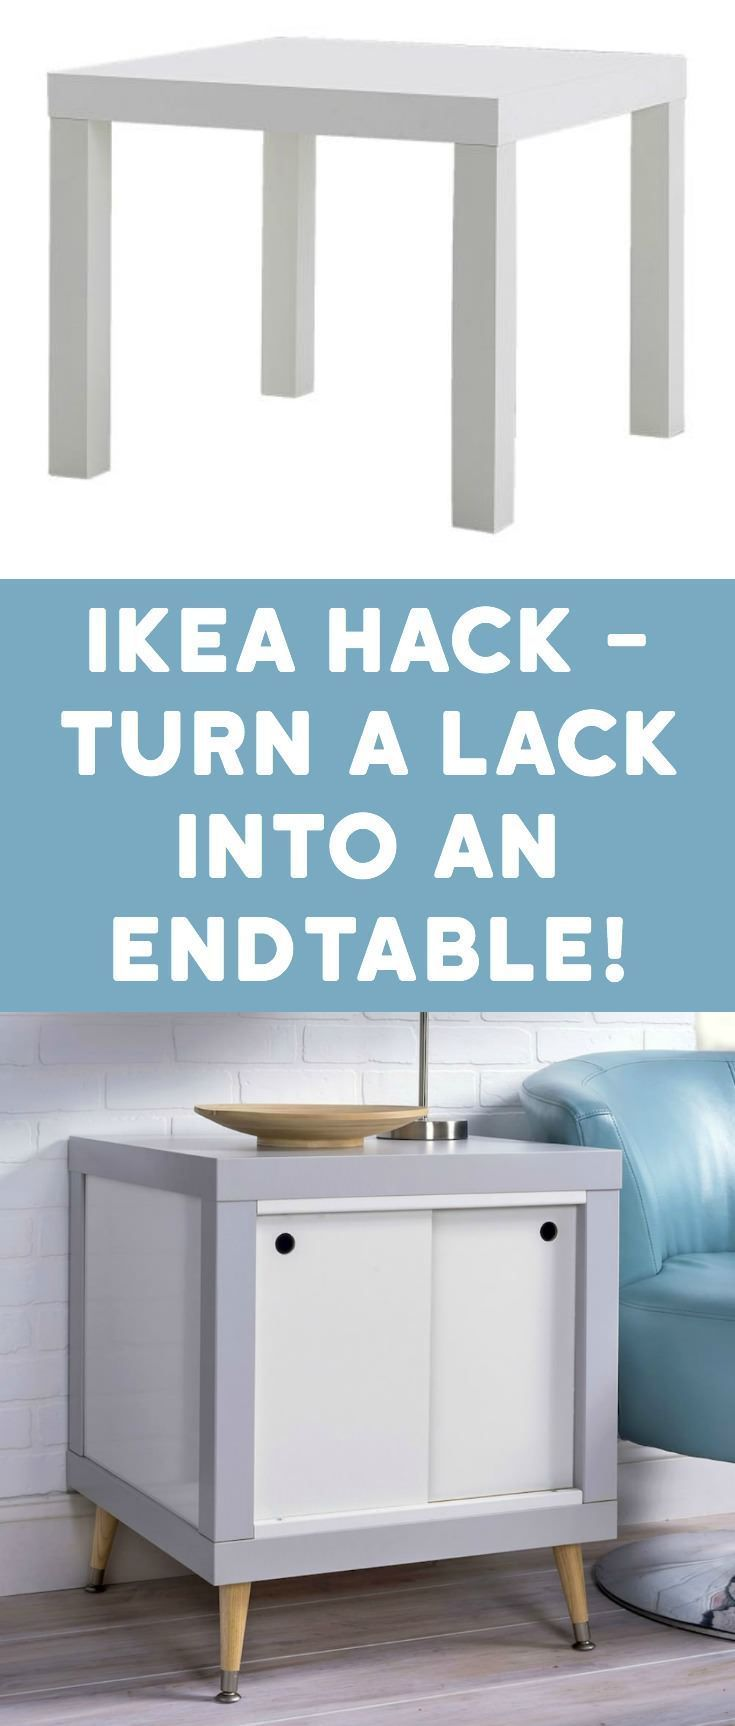 114 best ikea hacks images on pinterest ikea hacks home and